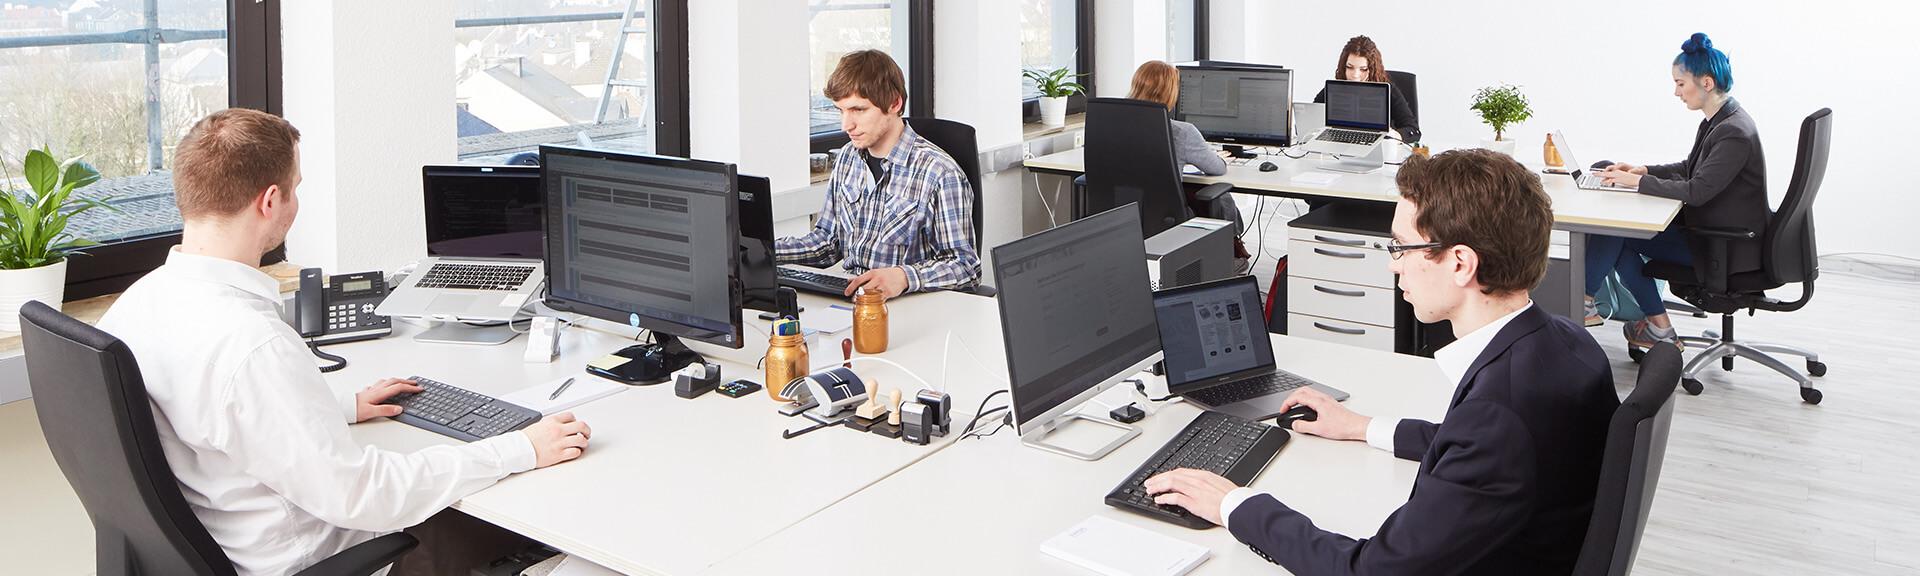 AWEOS GmbH - Full Service Werbeagentur